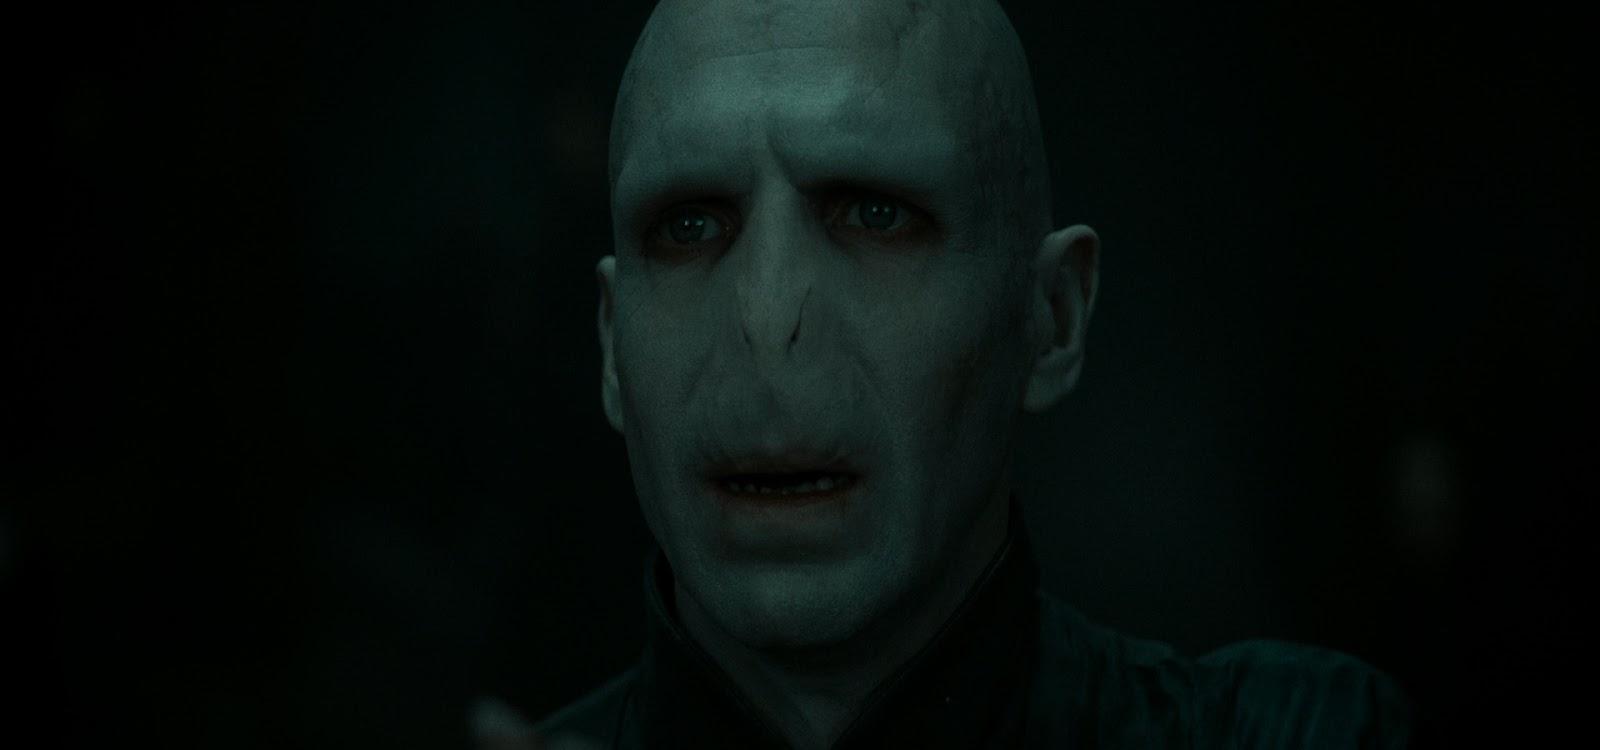 Harry Potter 7 Parte 2 HD 1080p Latino 60fps captura 1